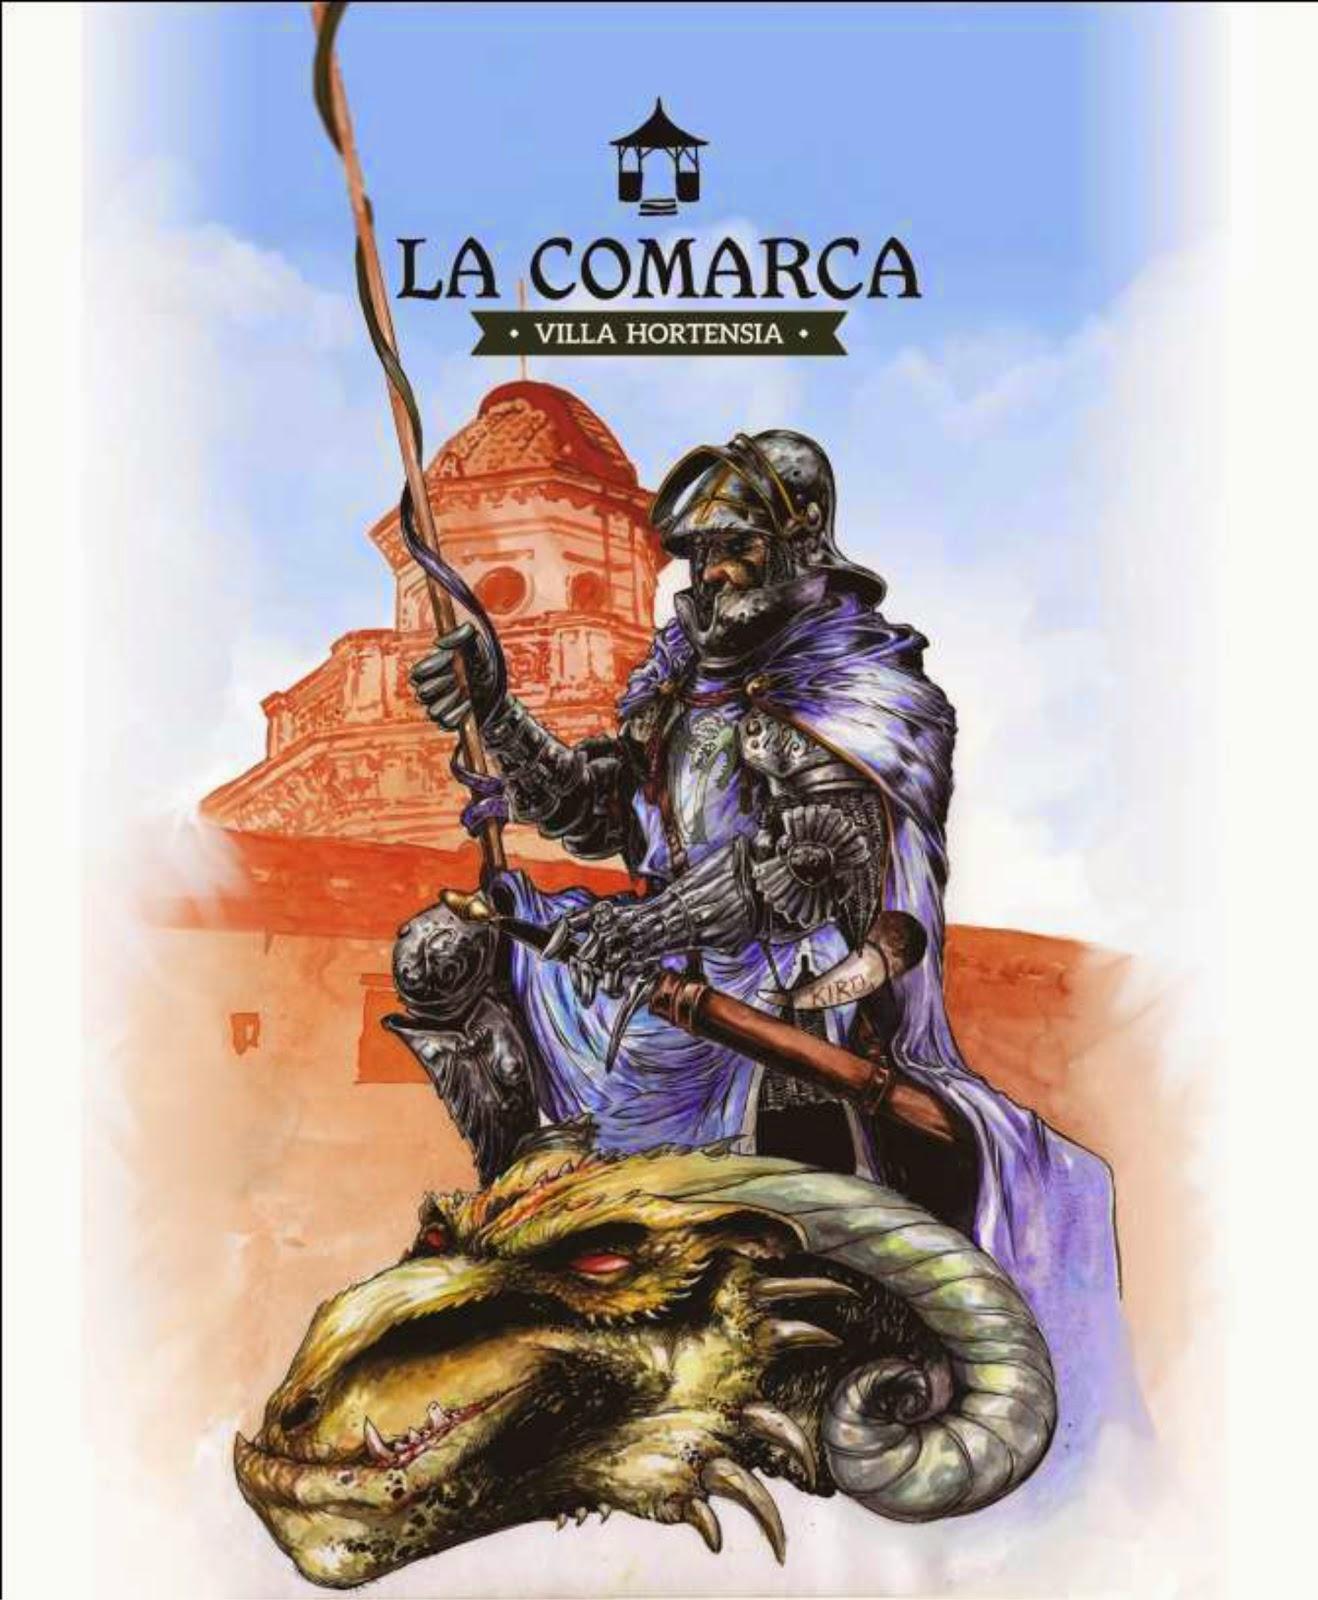 La Comarca I